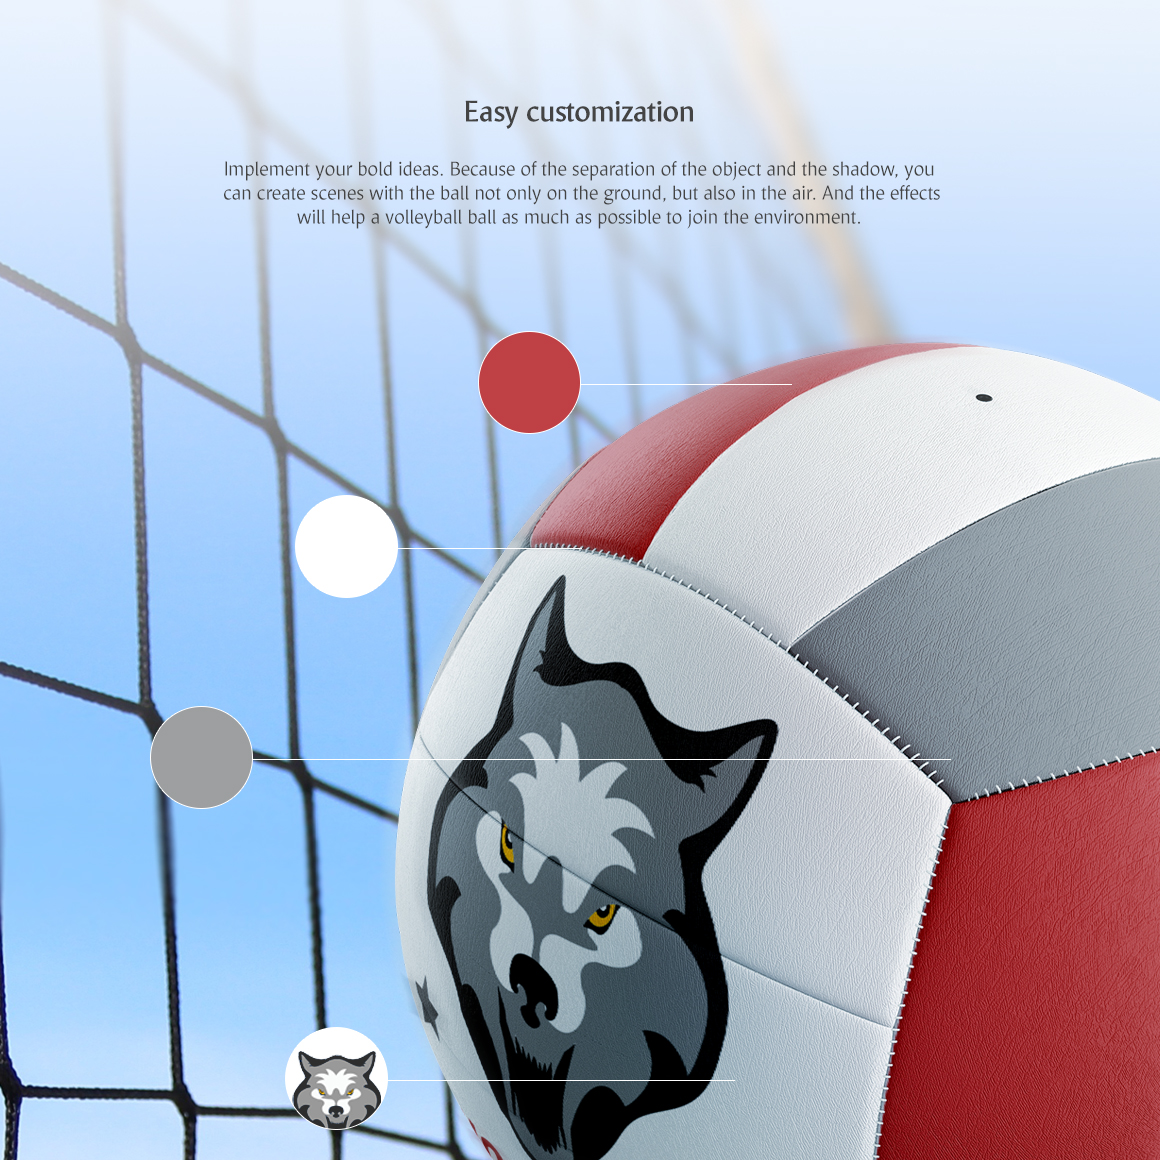 Volleyball Ball Animated Mockup example image 5